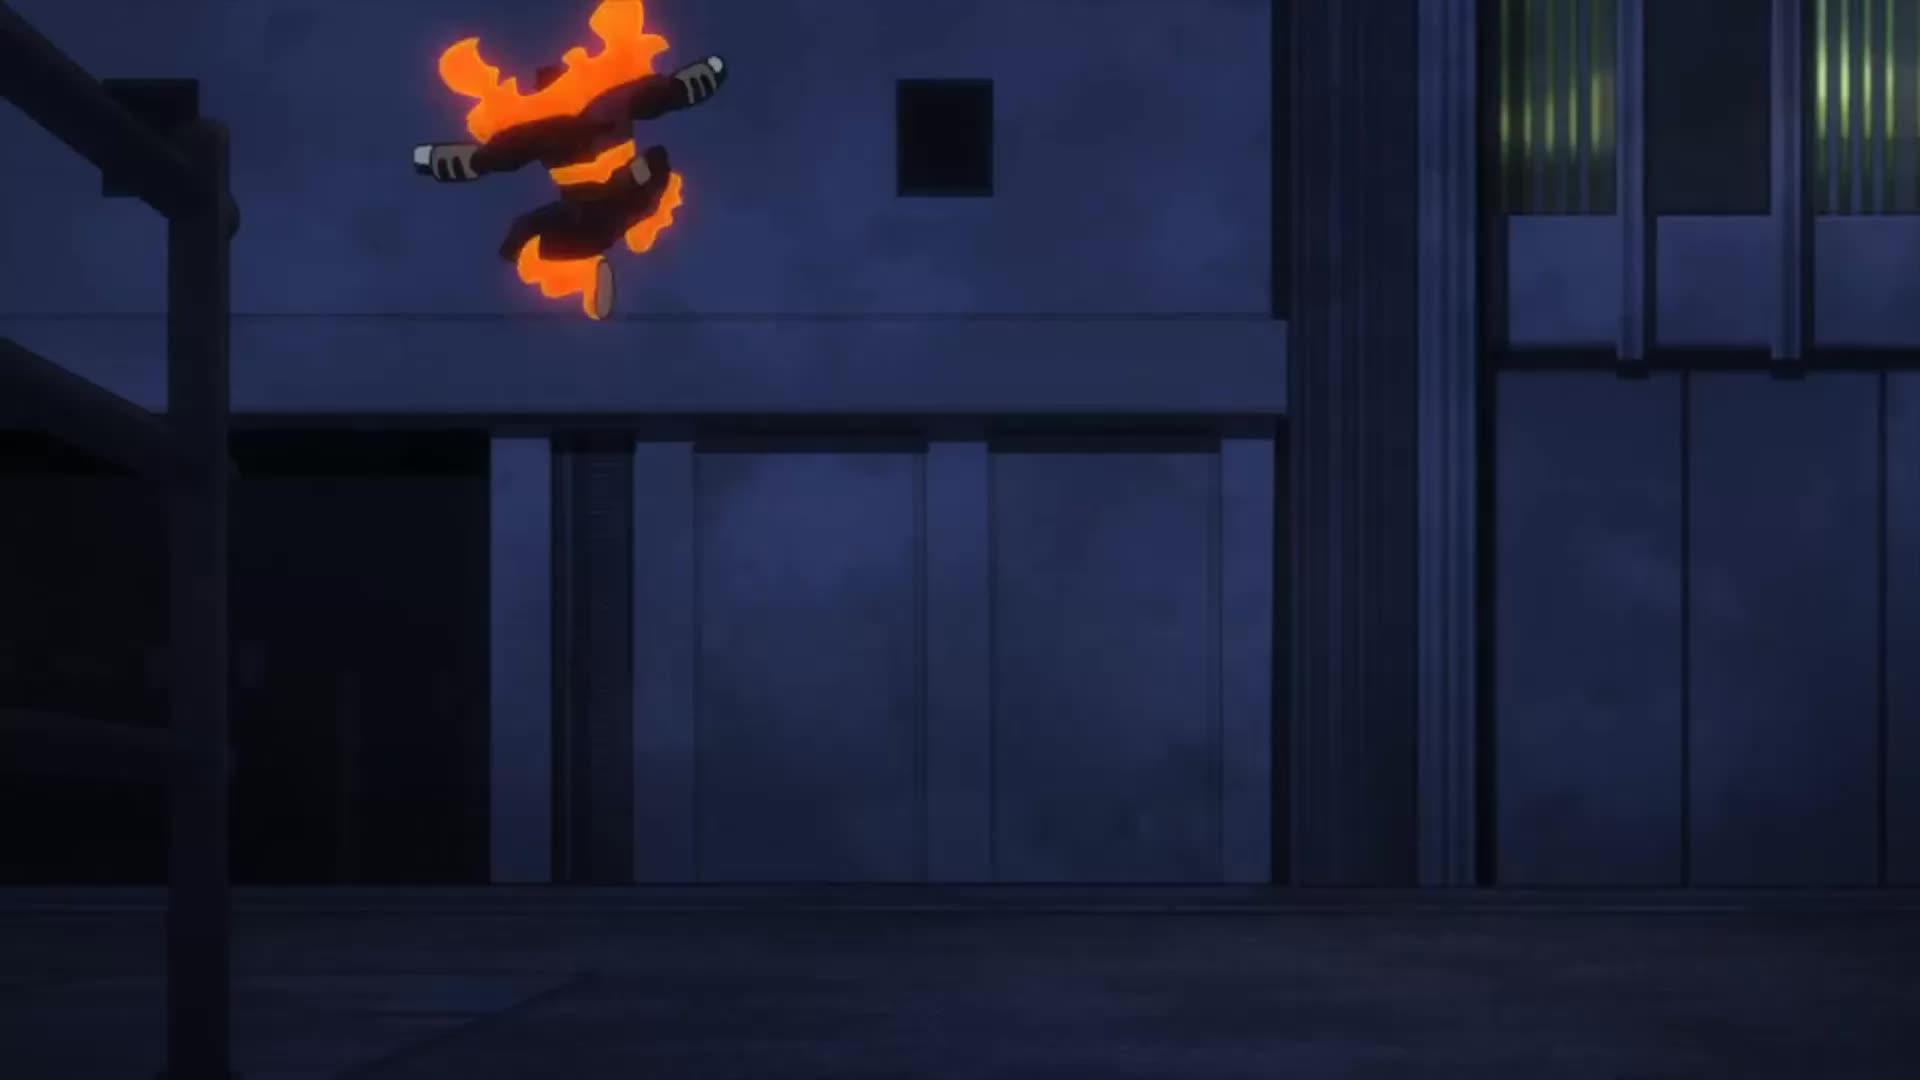 Flame Hero Endeavor GIFs